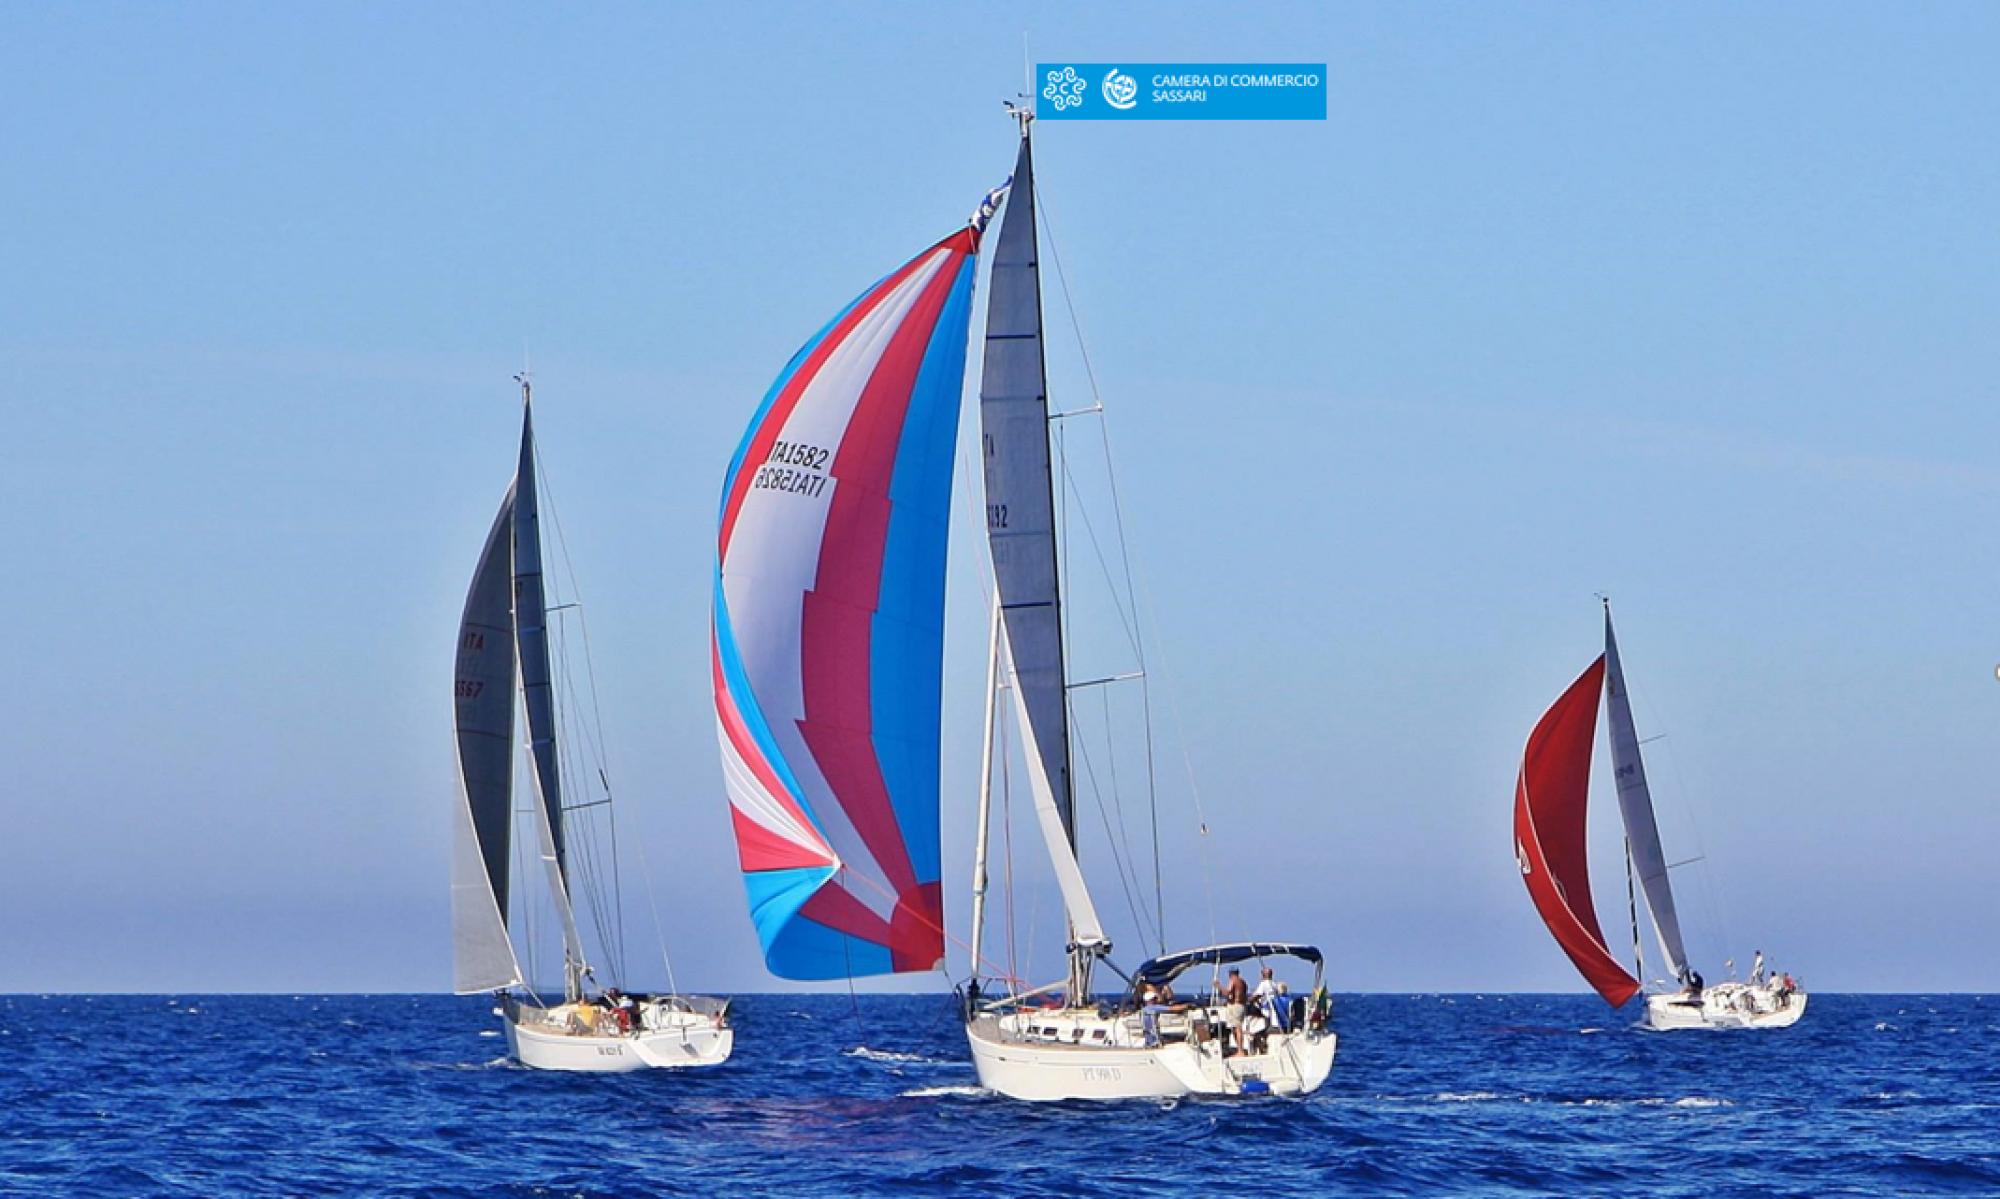 Assonautica Nord Sardegna